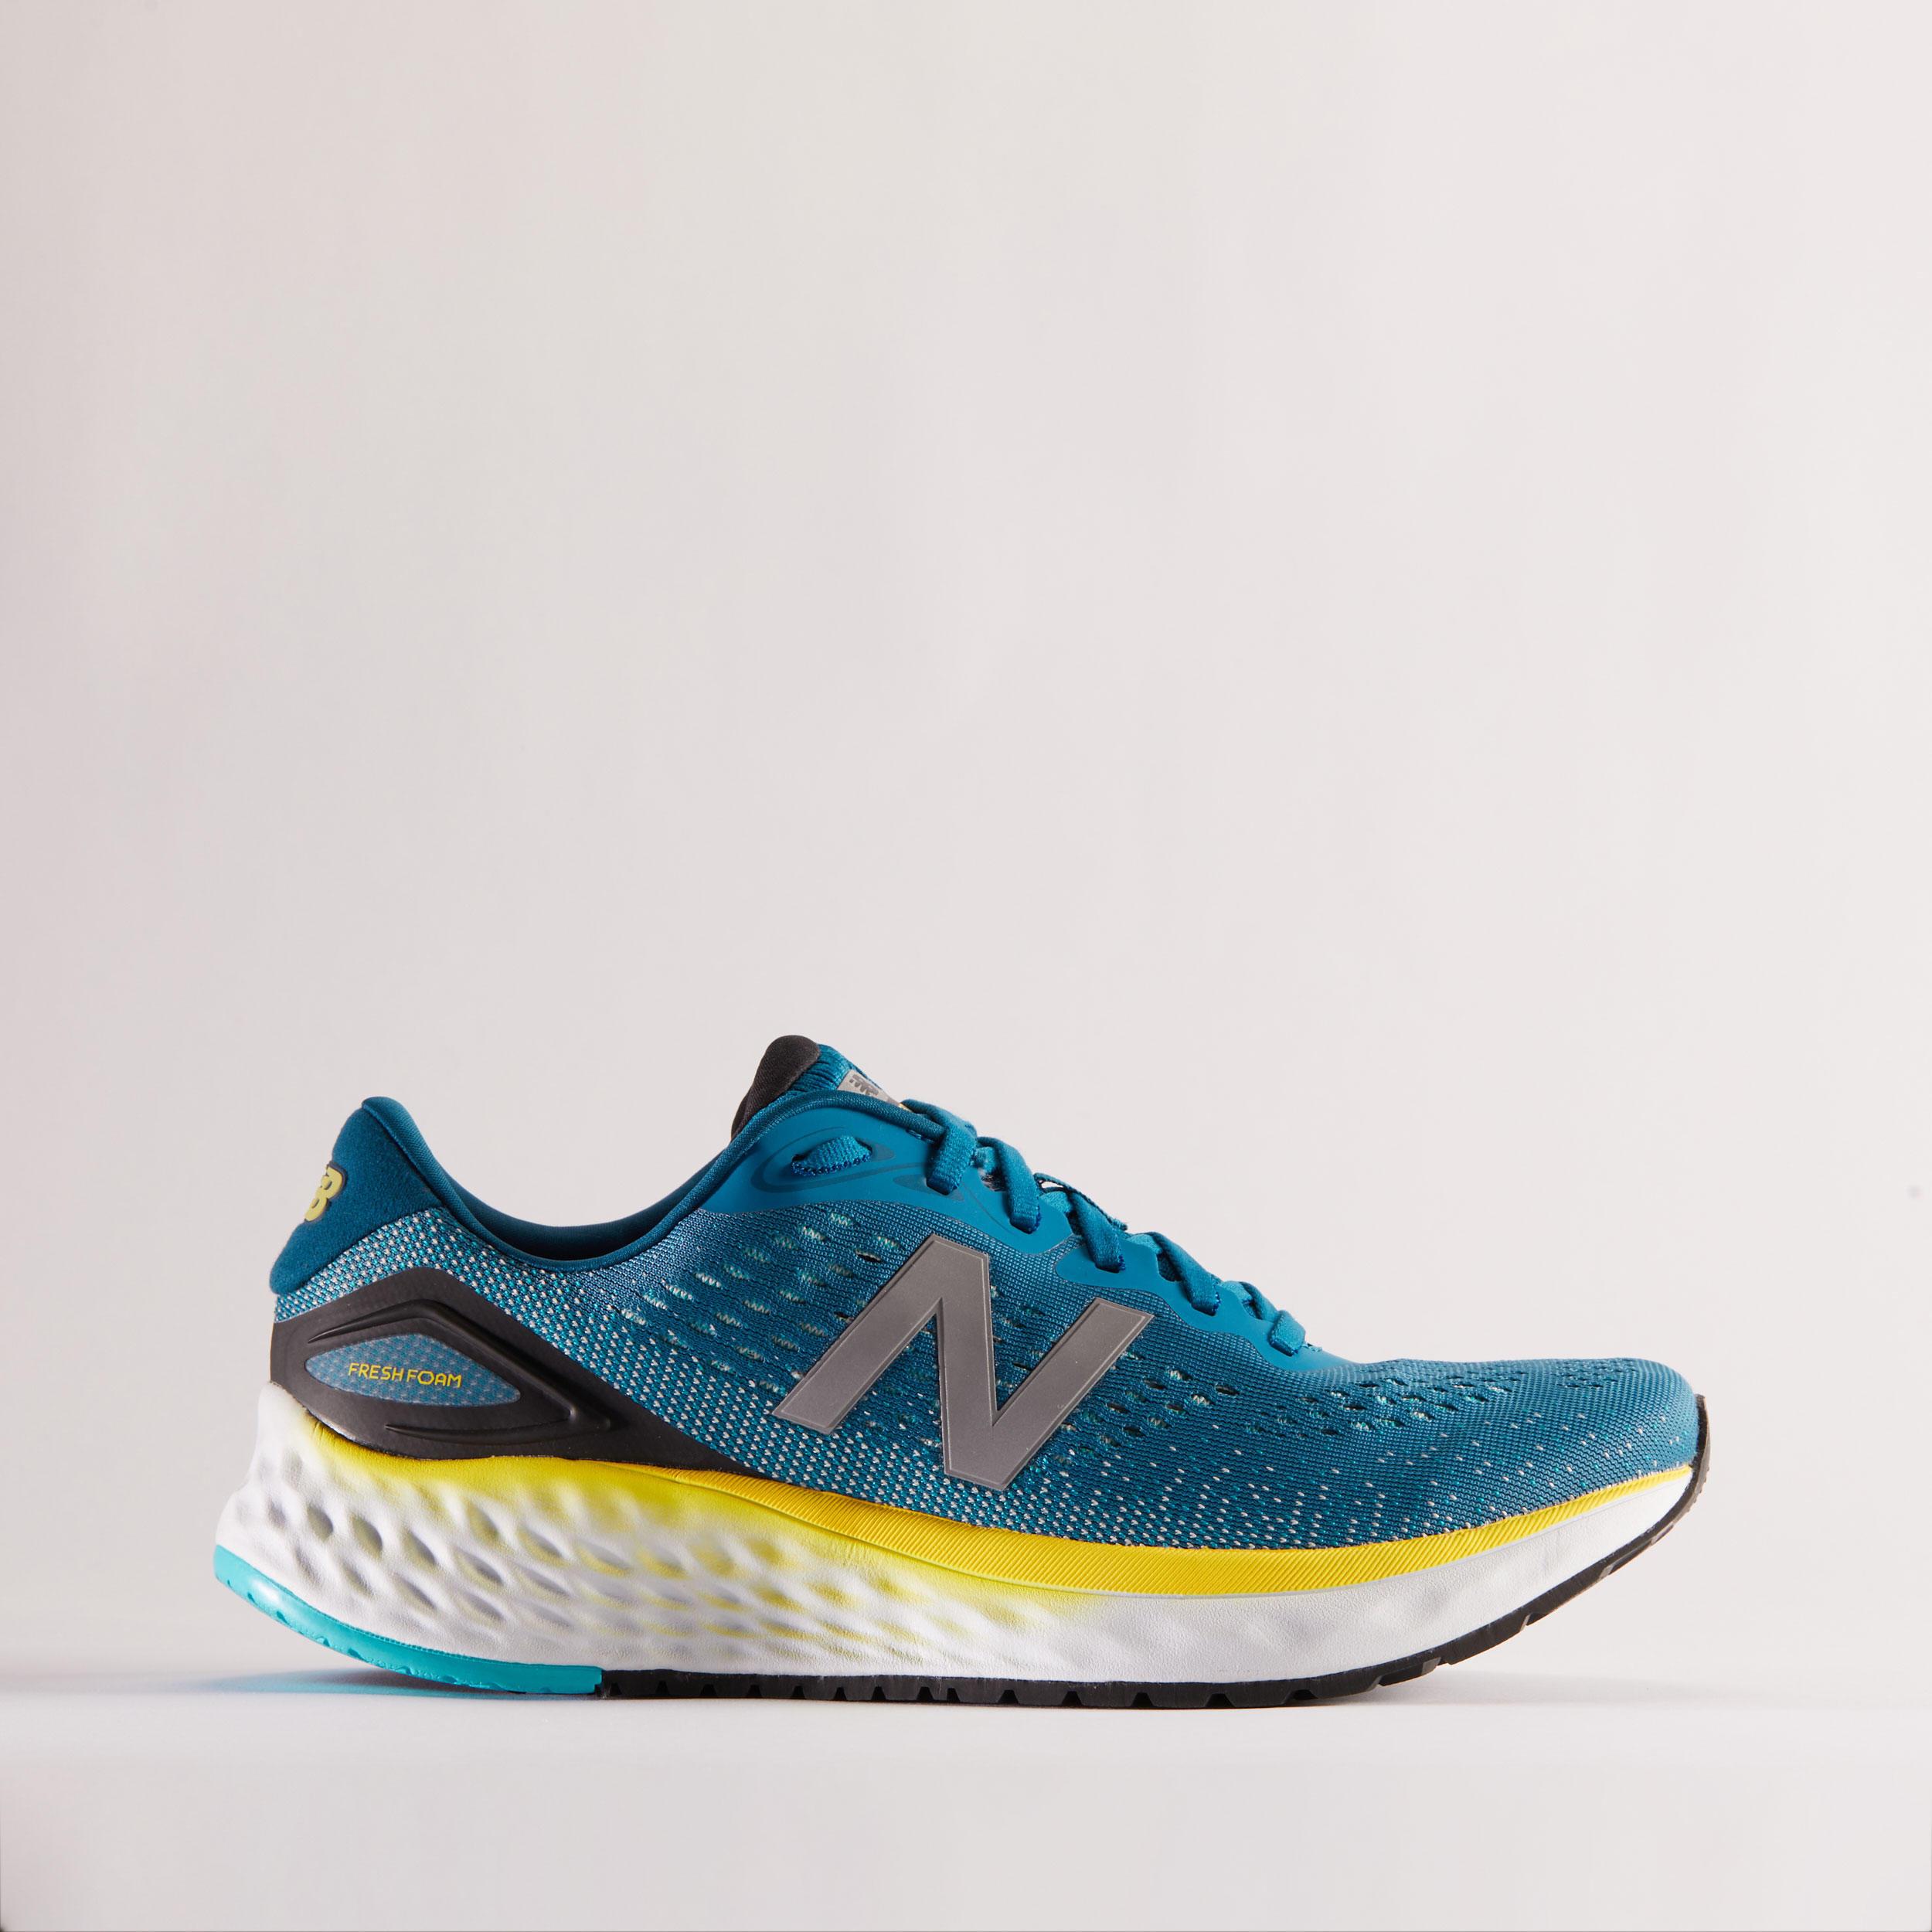 Scarpe running uomo FRESH FOAM azzurre